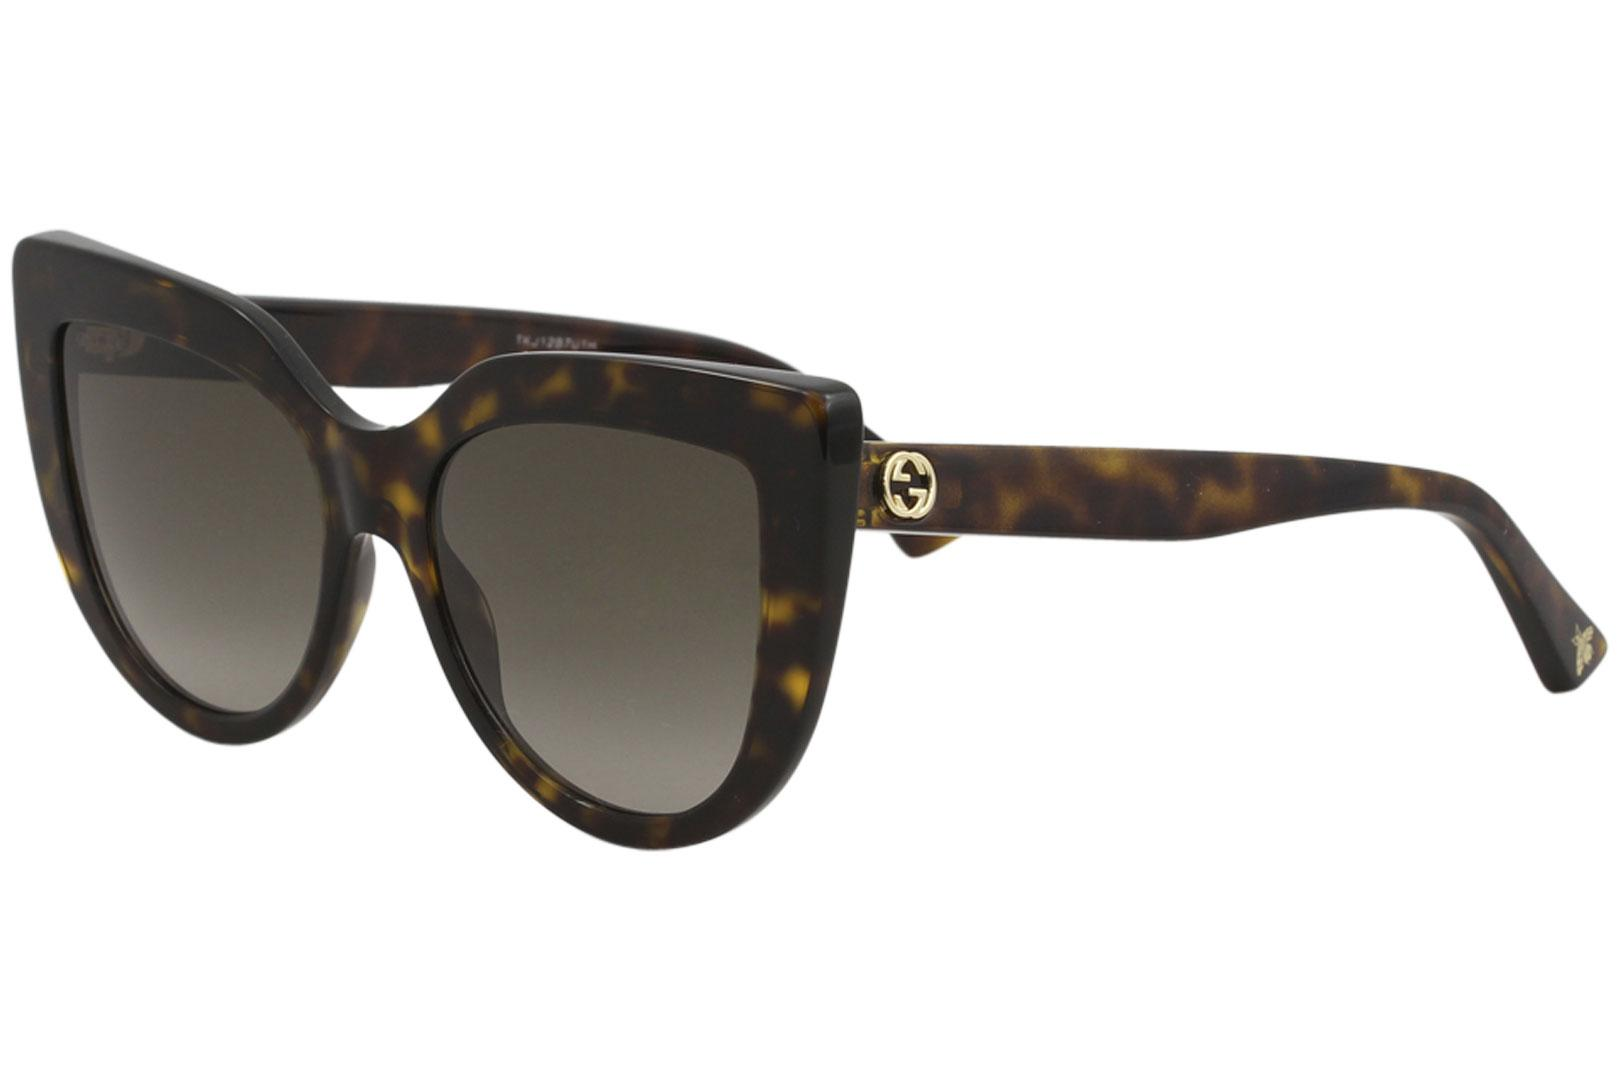 3acc4bb69 Gucci Women s Urban GG0164S GG 0164 S Fashion Cat Eye Sunglasses by Gucci